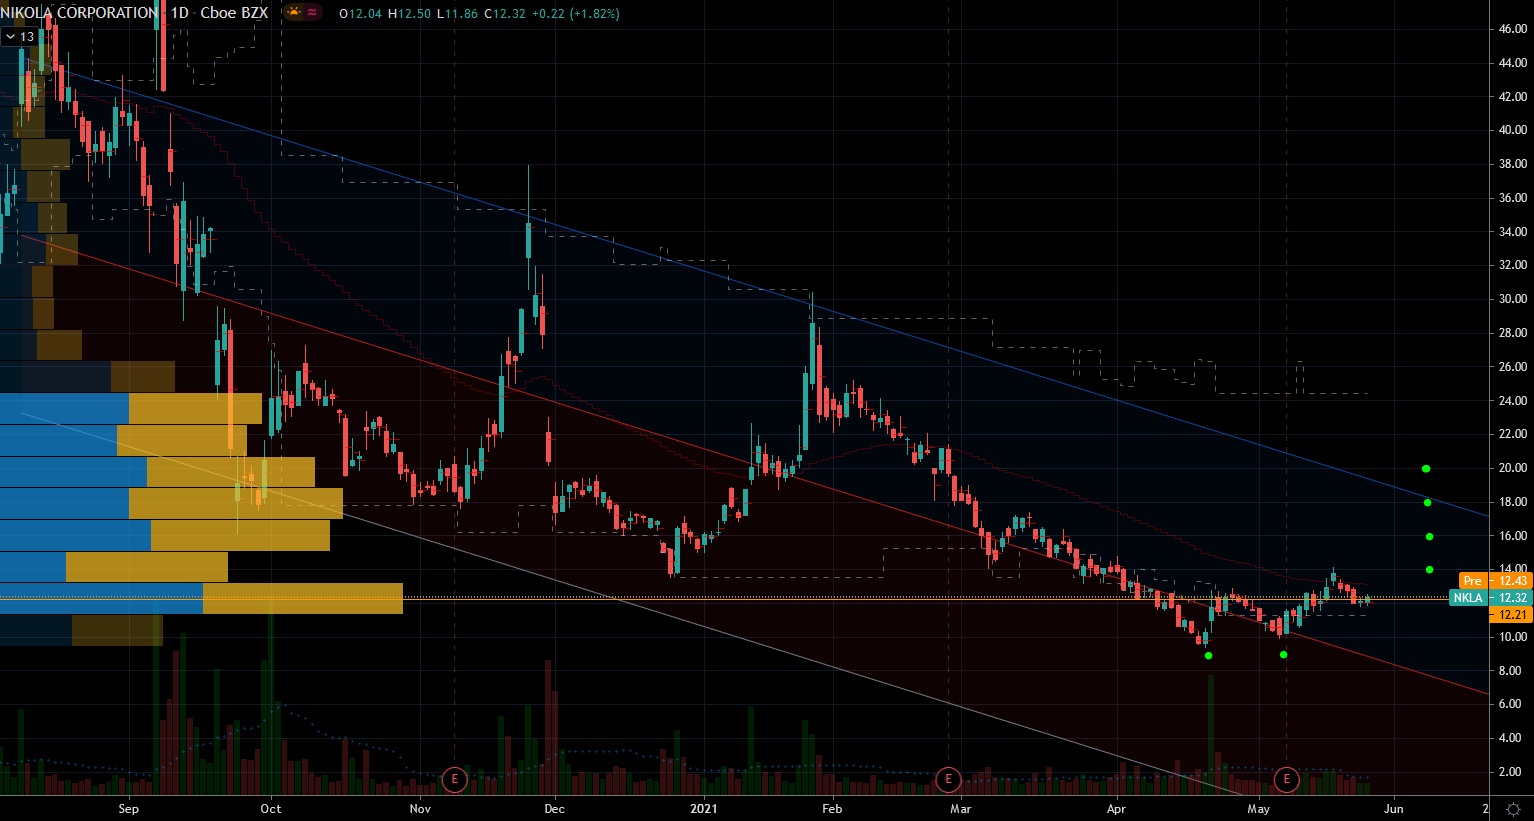 Nikola (NKLA) Stock Chart Showing Falling Kinfe